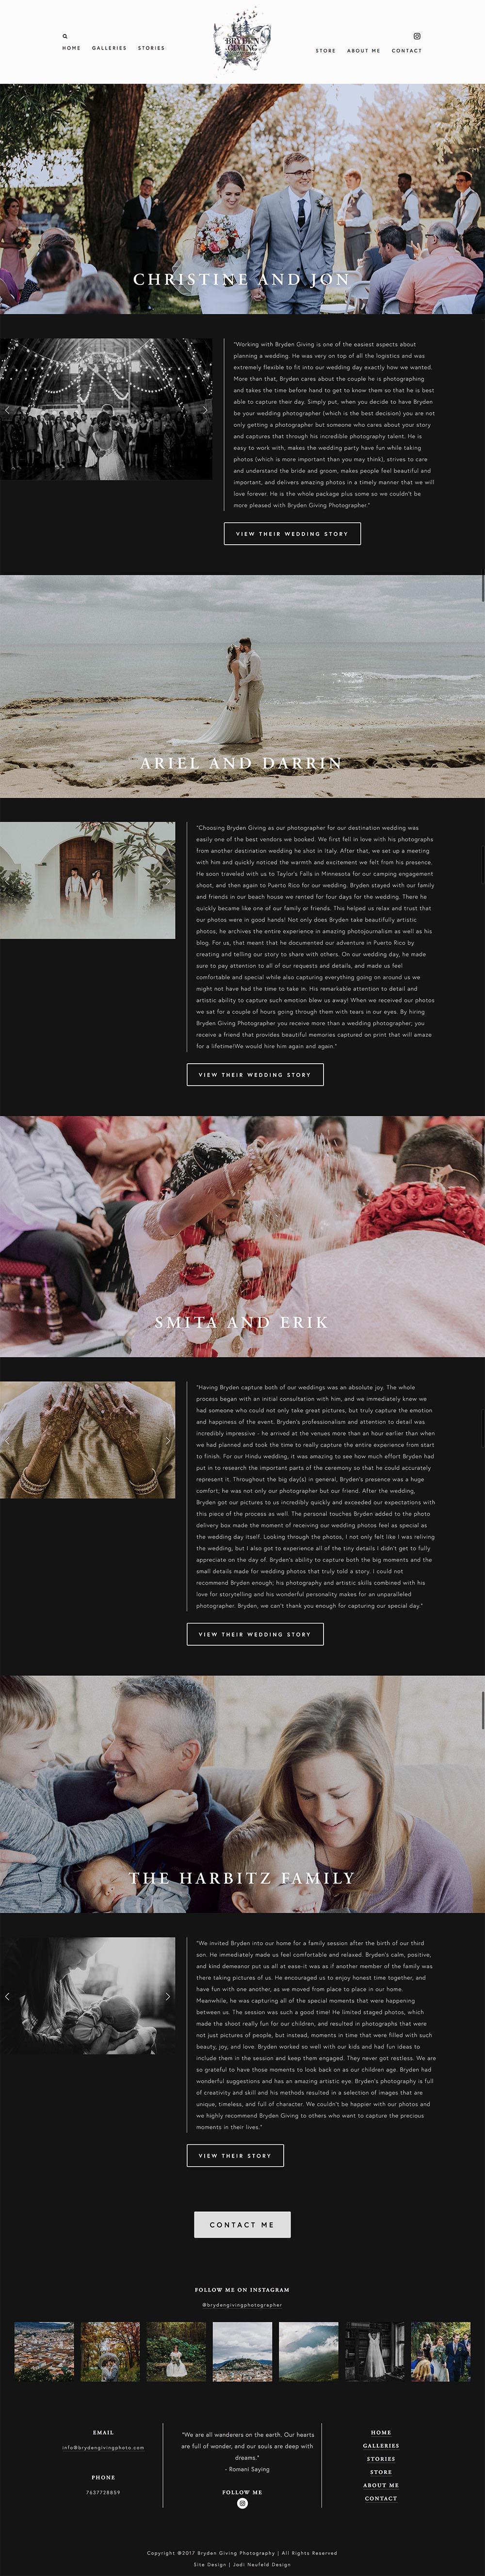 Bryden Giving Photographer   testimonials page   custom Photography website by Jodi Neufeld Design